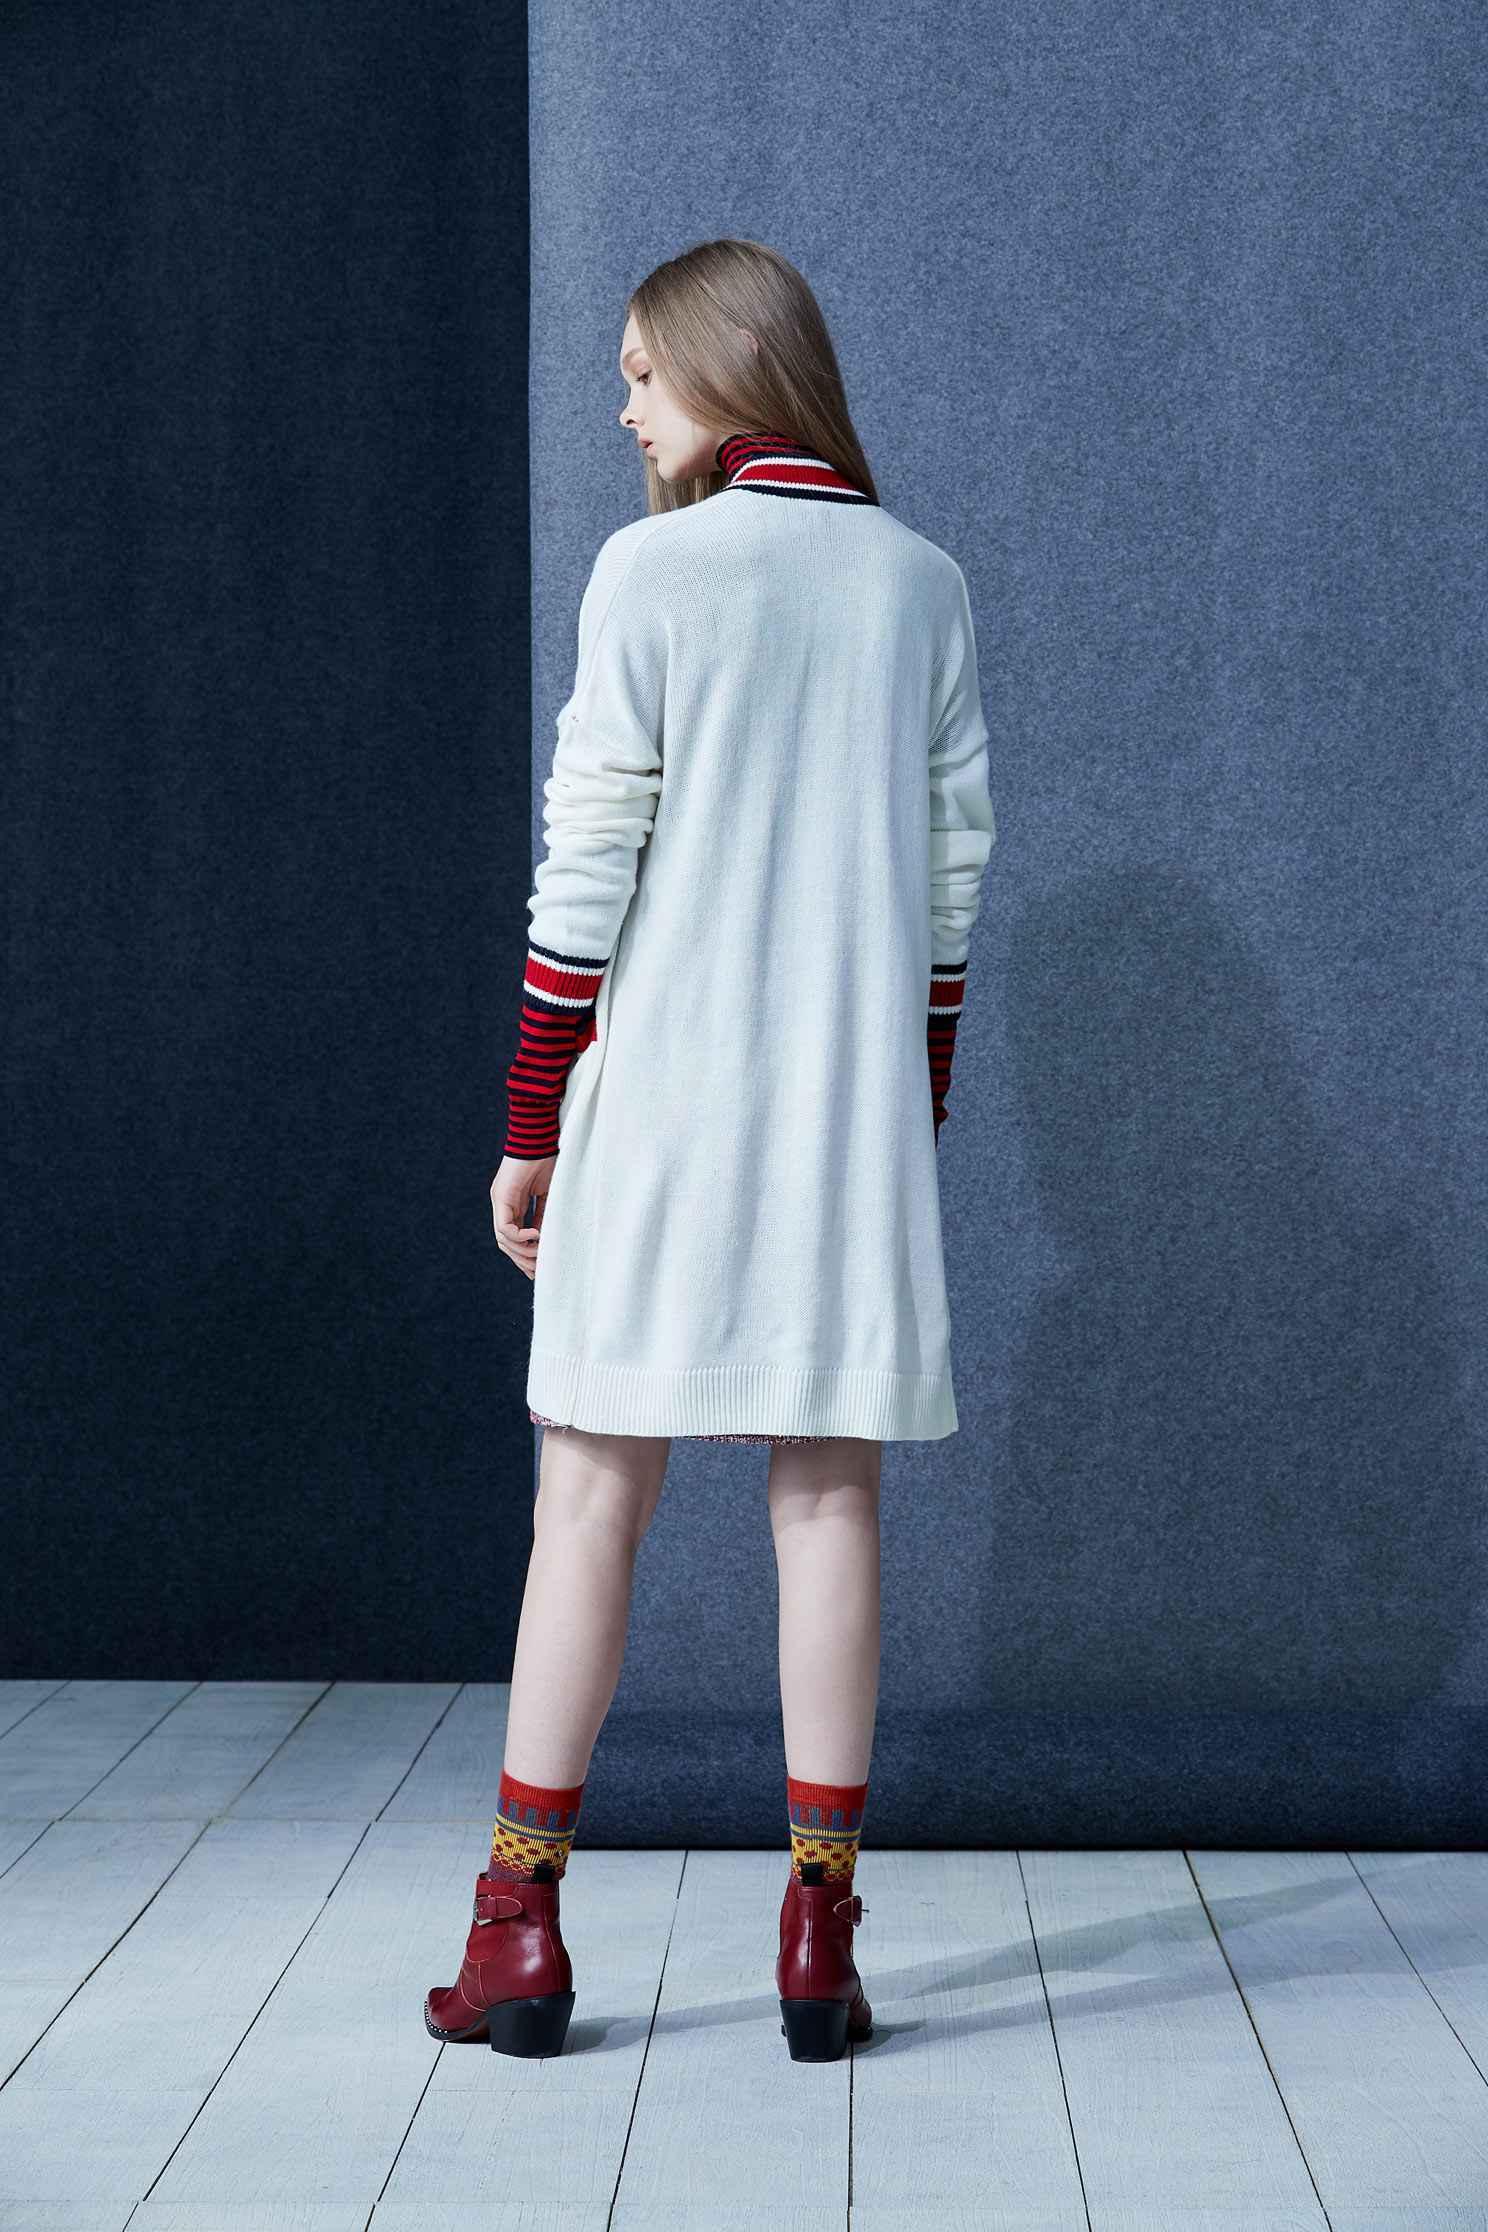 Mixing stripes coat,firesigns,whiteouterwear,cardigan,knitting,knittedjacket,longcoat,longsleeveouterwear